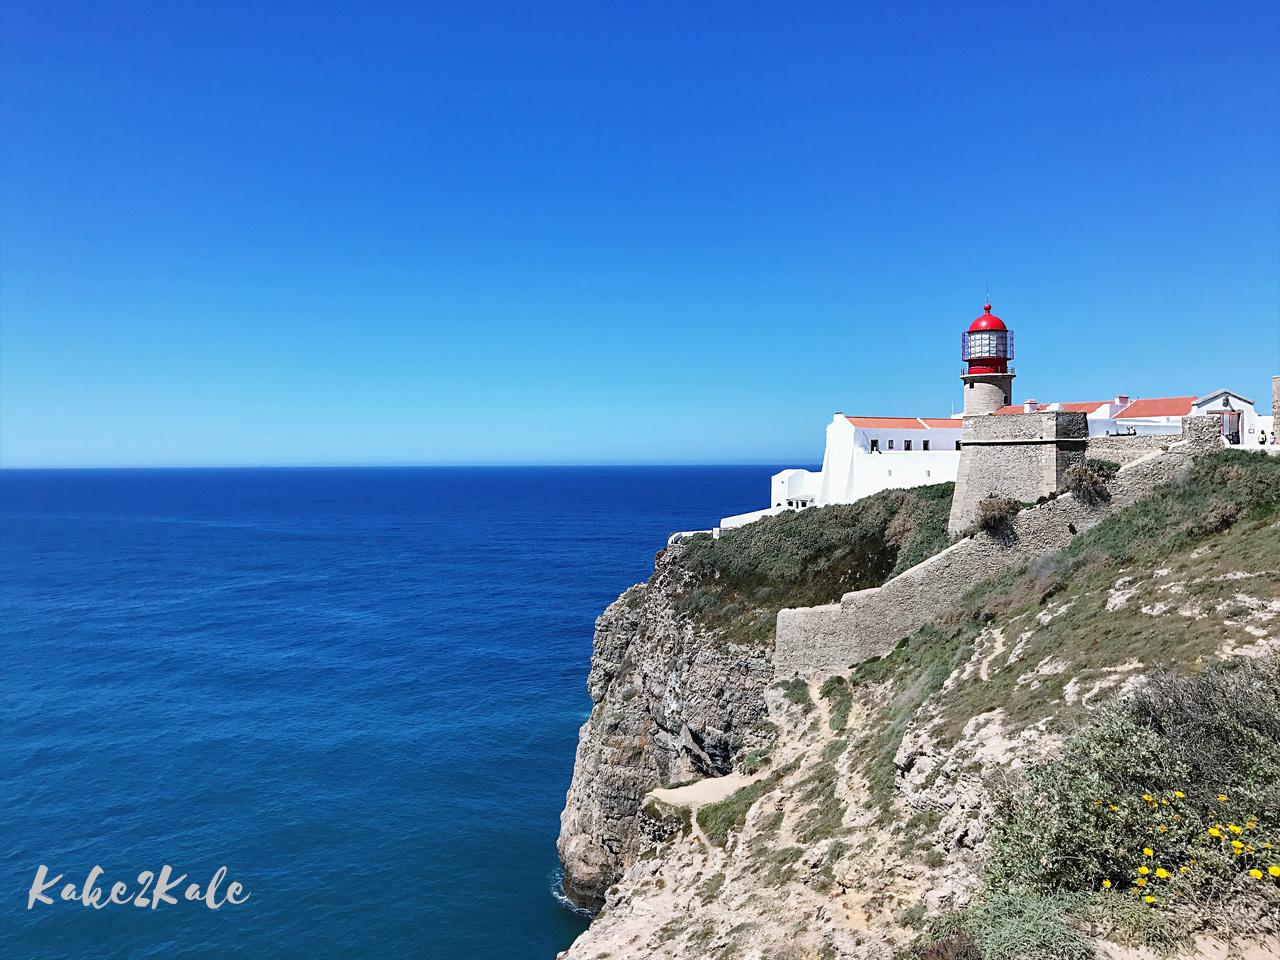 Kake2Kale Wild Coast Portugal - Cabo de Sao Vincente (Sagres)